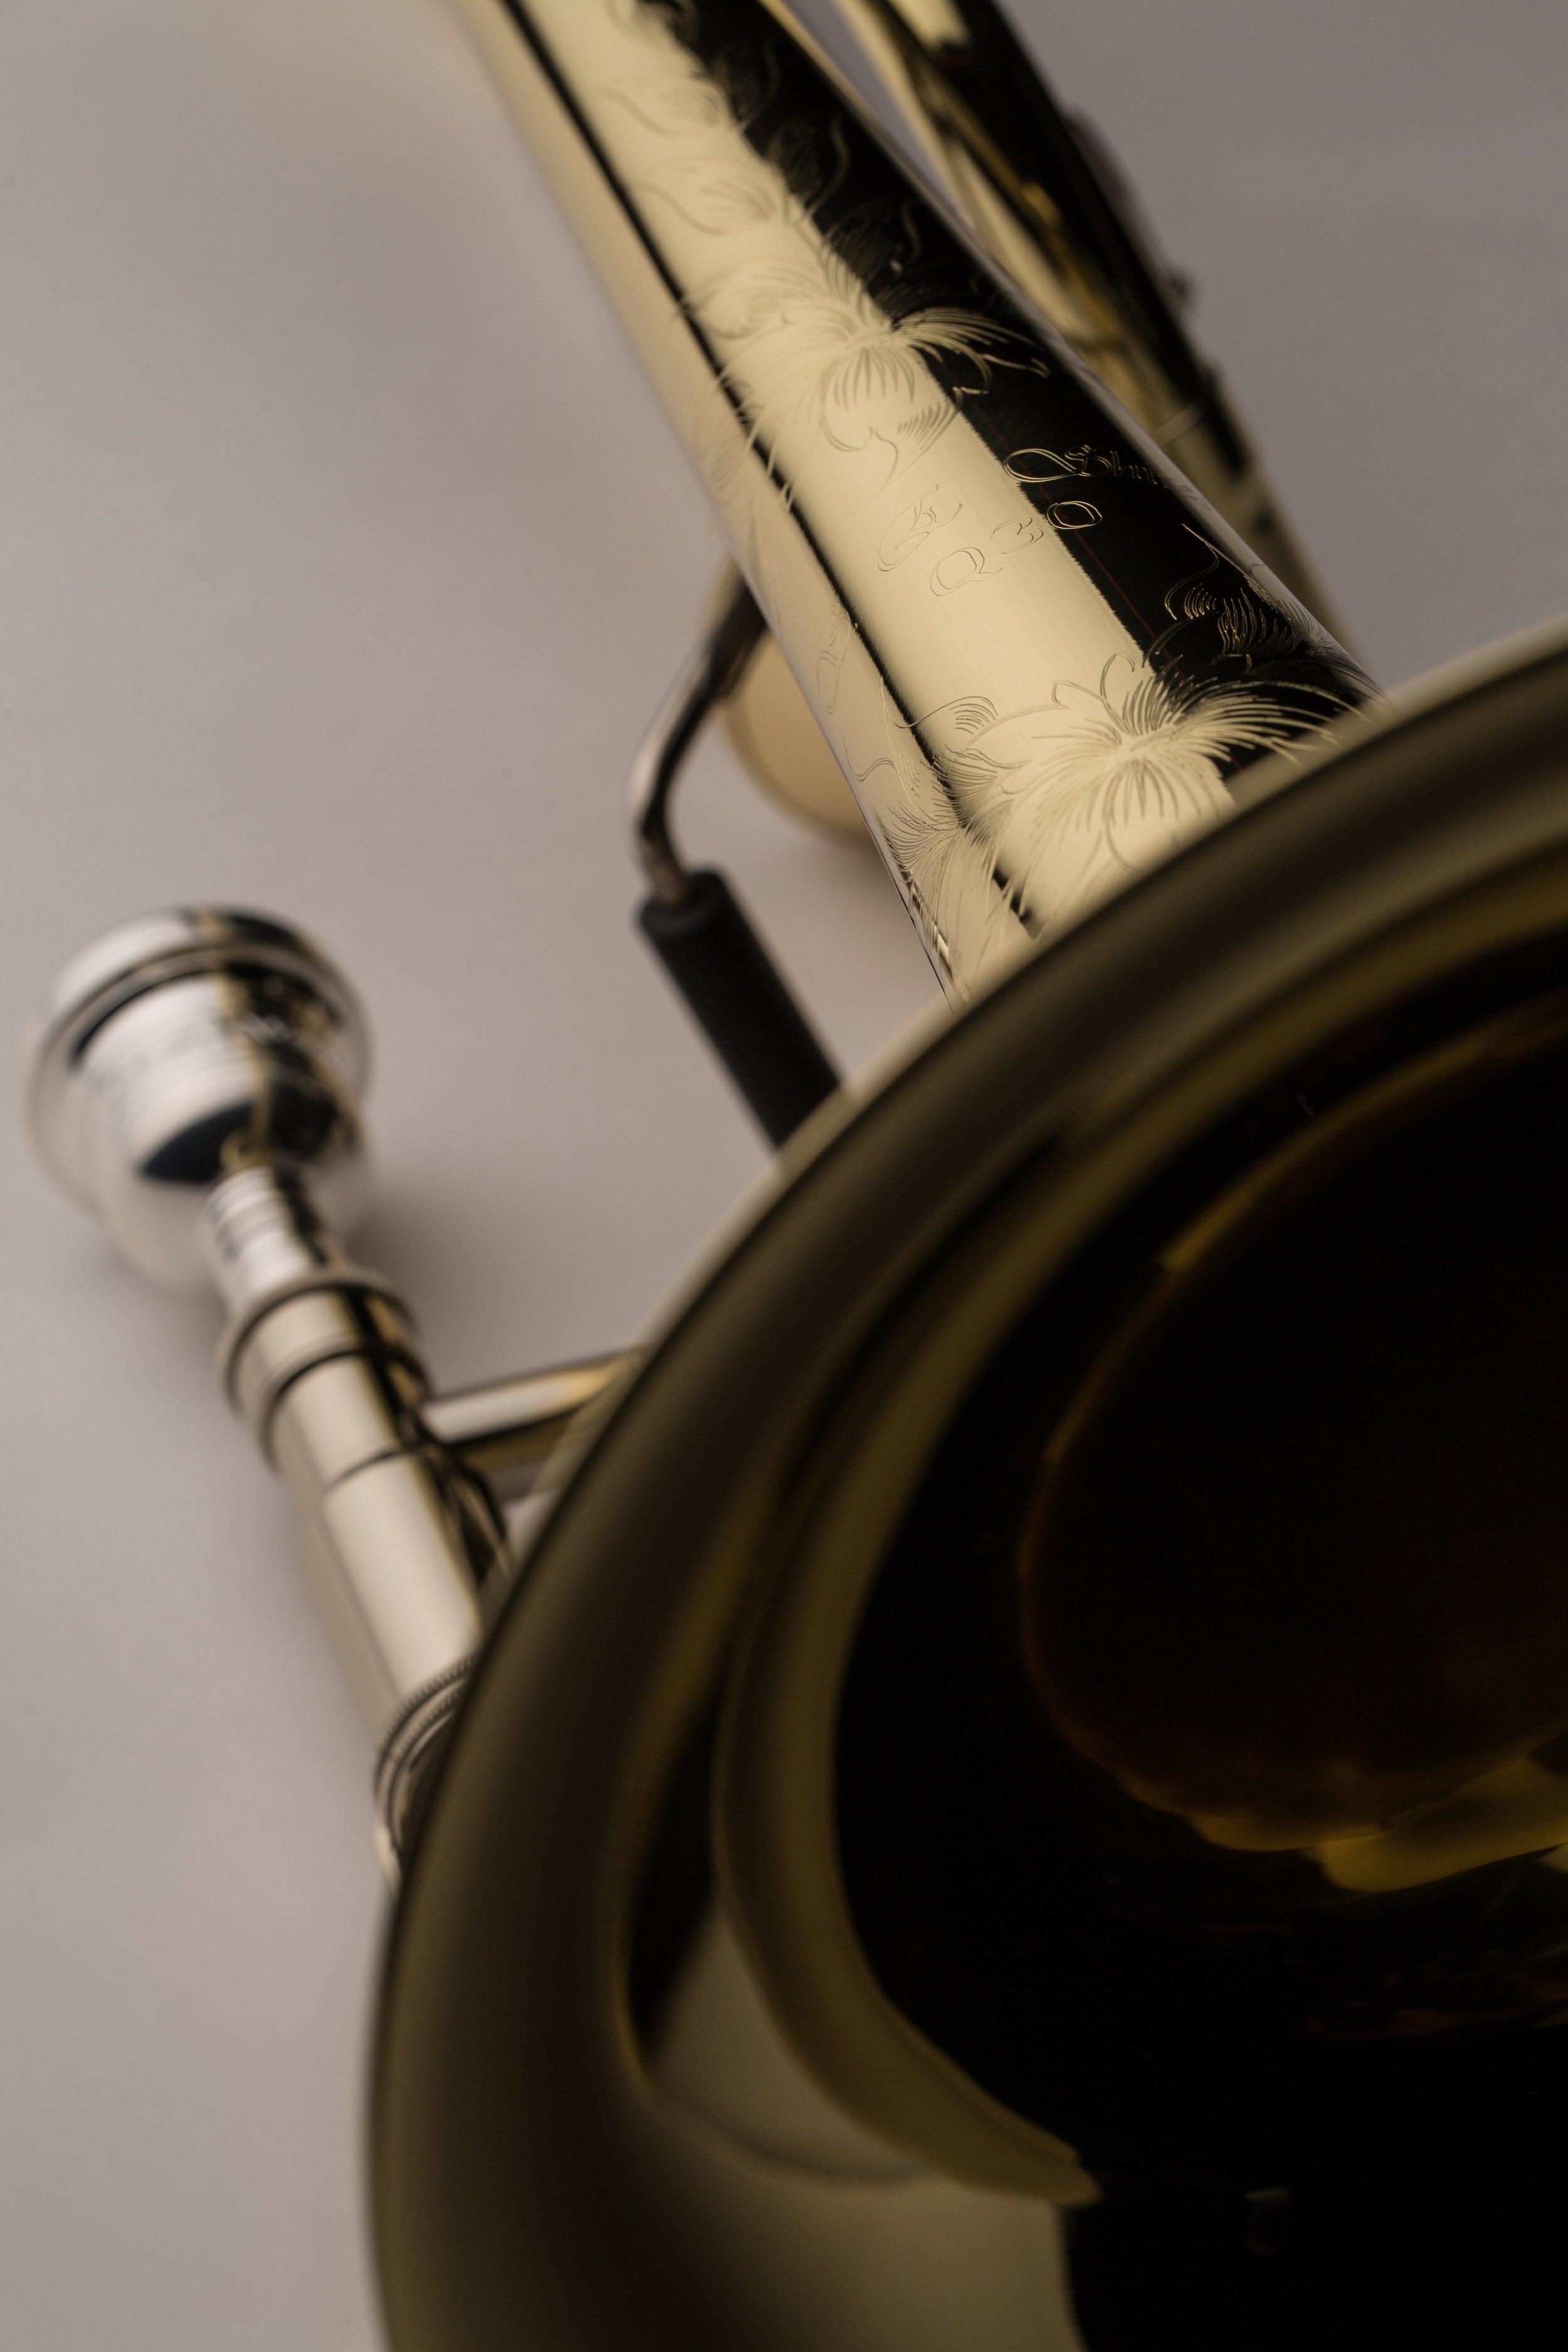 Shires_Trombone_TBQ30YA_CU_Bell_0718.jpg